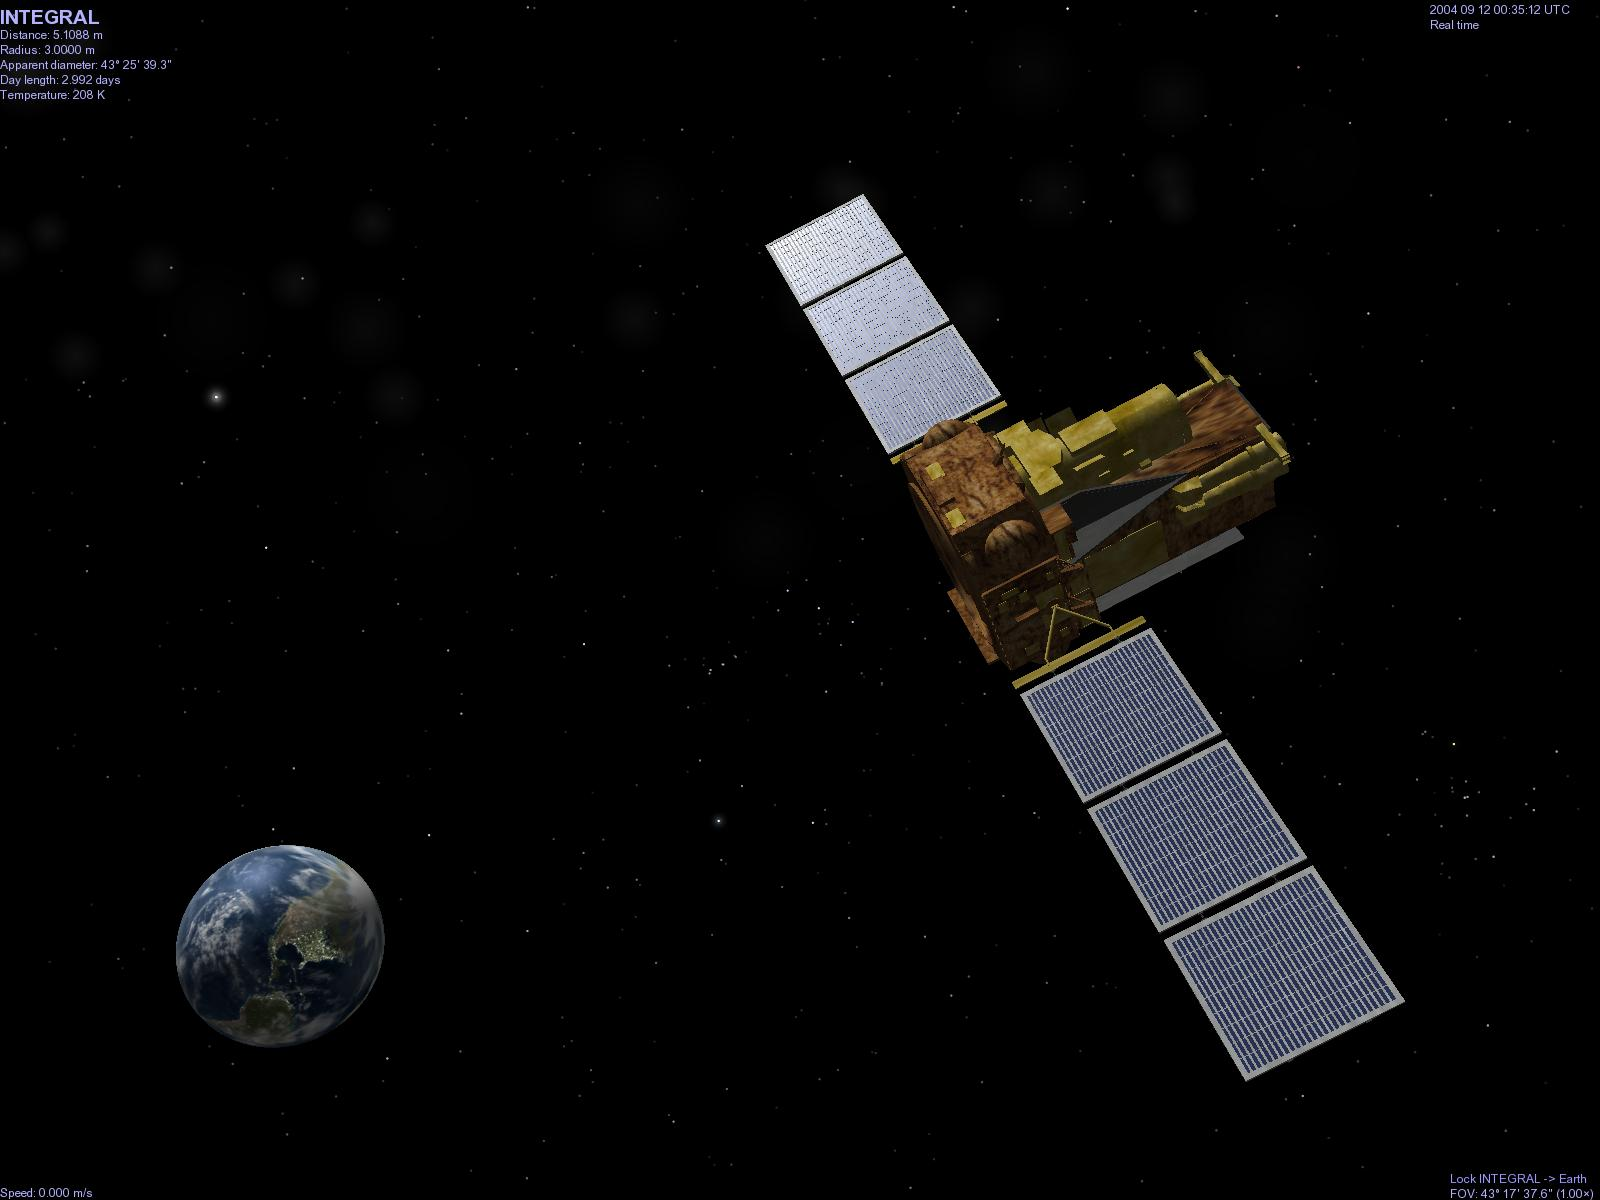 Kerberos Moon Of Plluto: Selden's List Of Spacecraft Orbits For Celestia